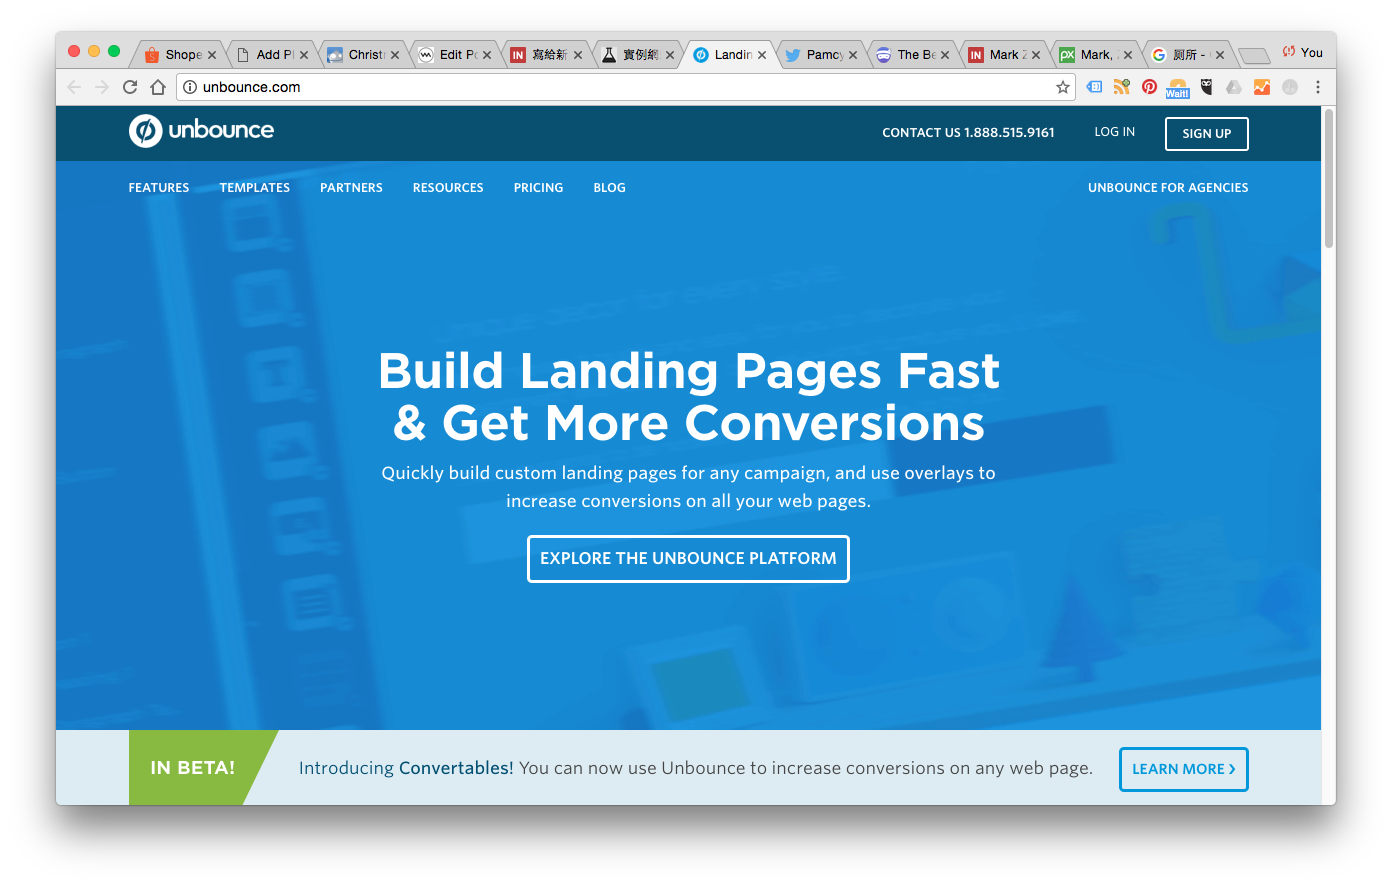 unbounce是业界知名制作Landing Page的网站